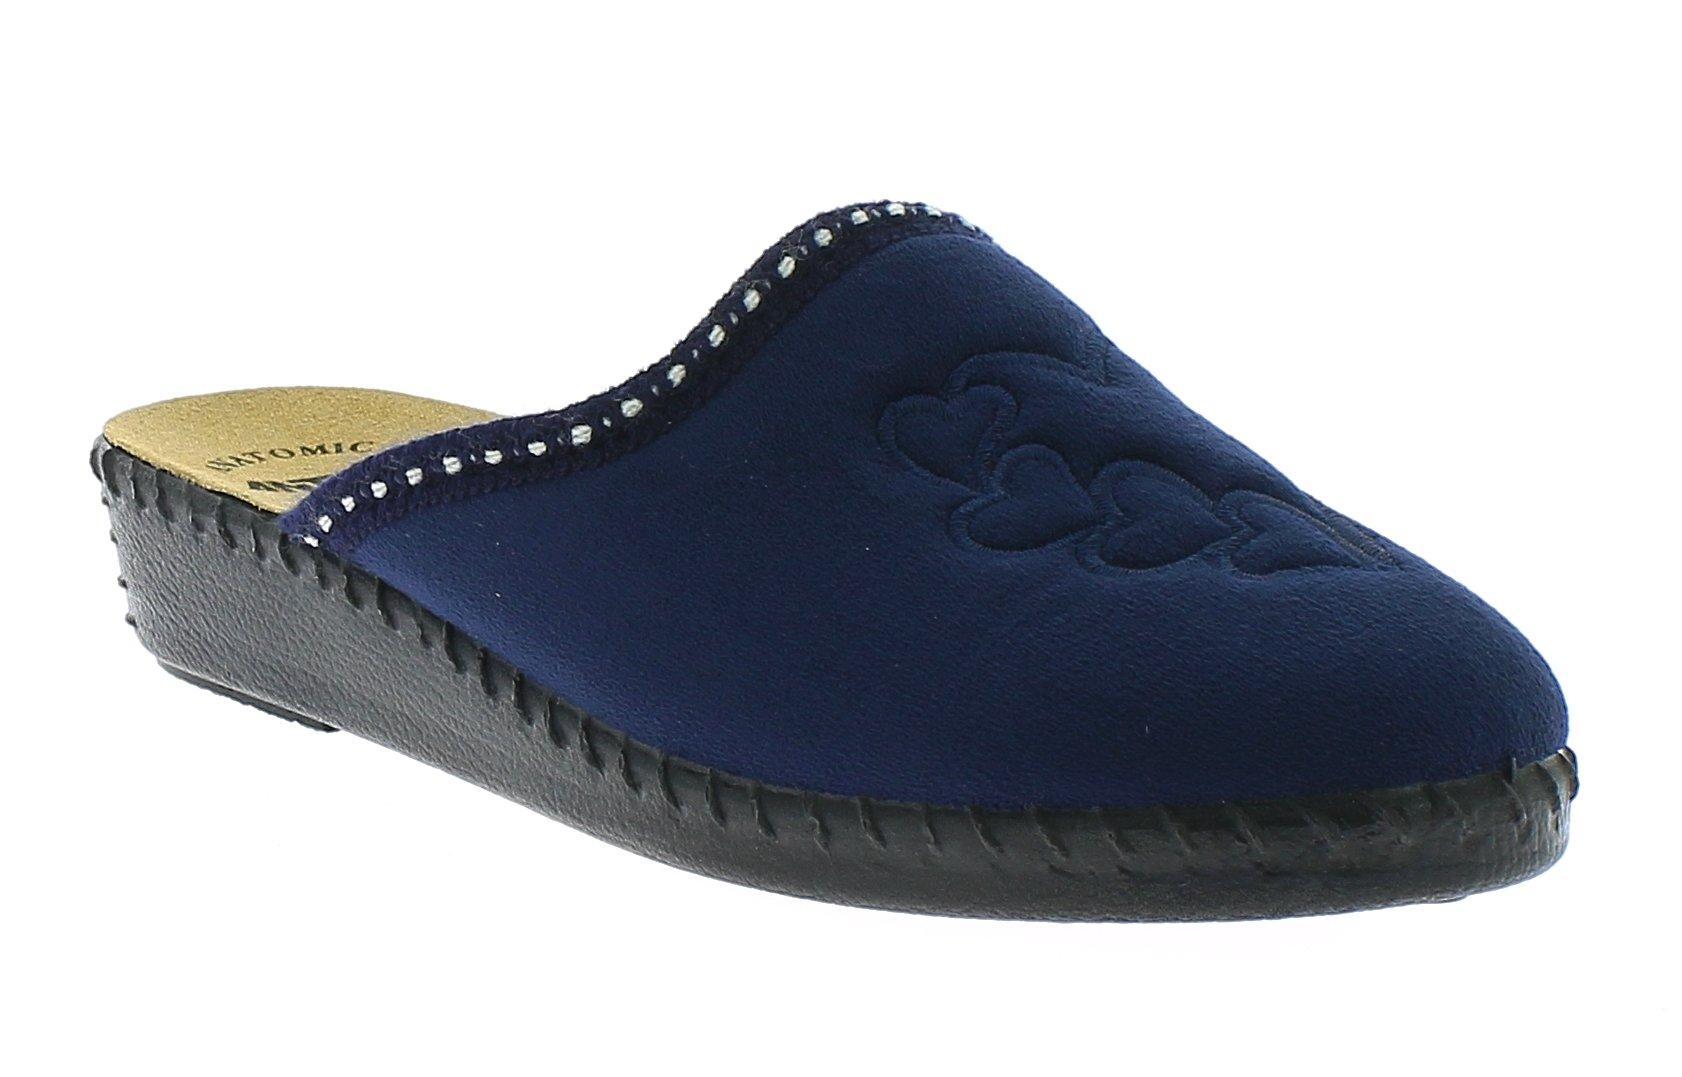 ANTRIN Γυναικεία Παντόφλα 30 260 Μπλε - Μπλε - 30 260 NAVY-blue-35/4/10/67